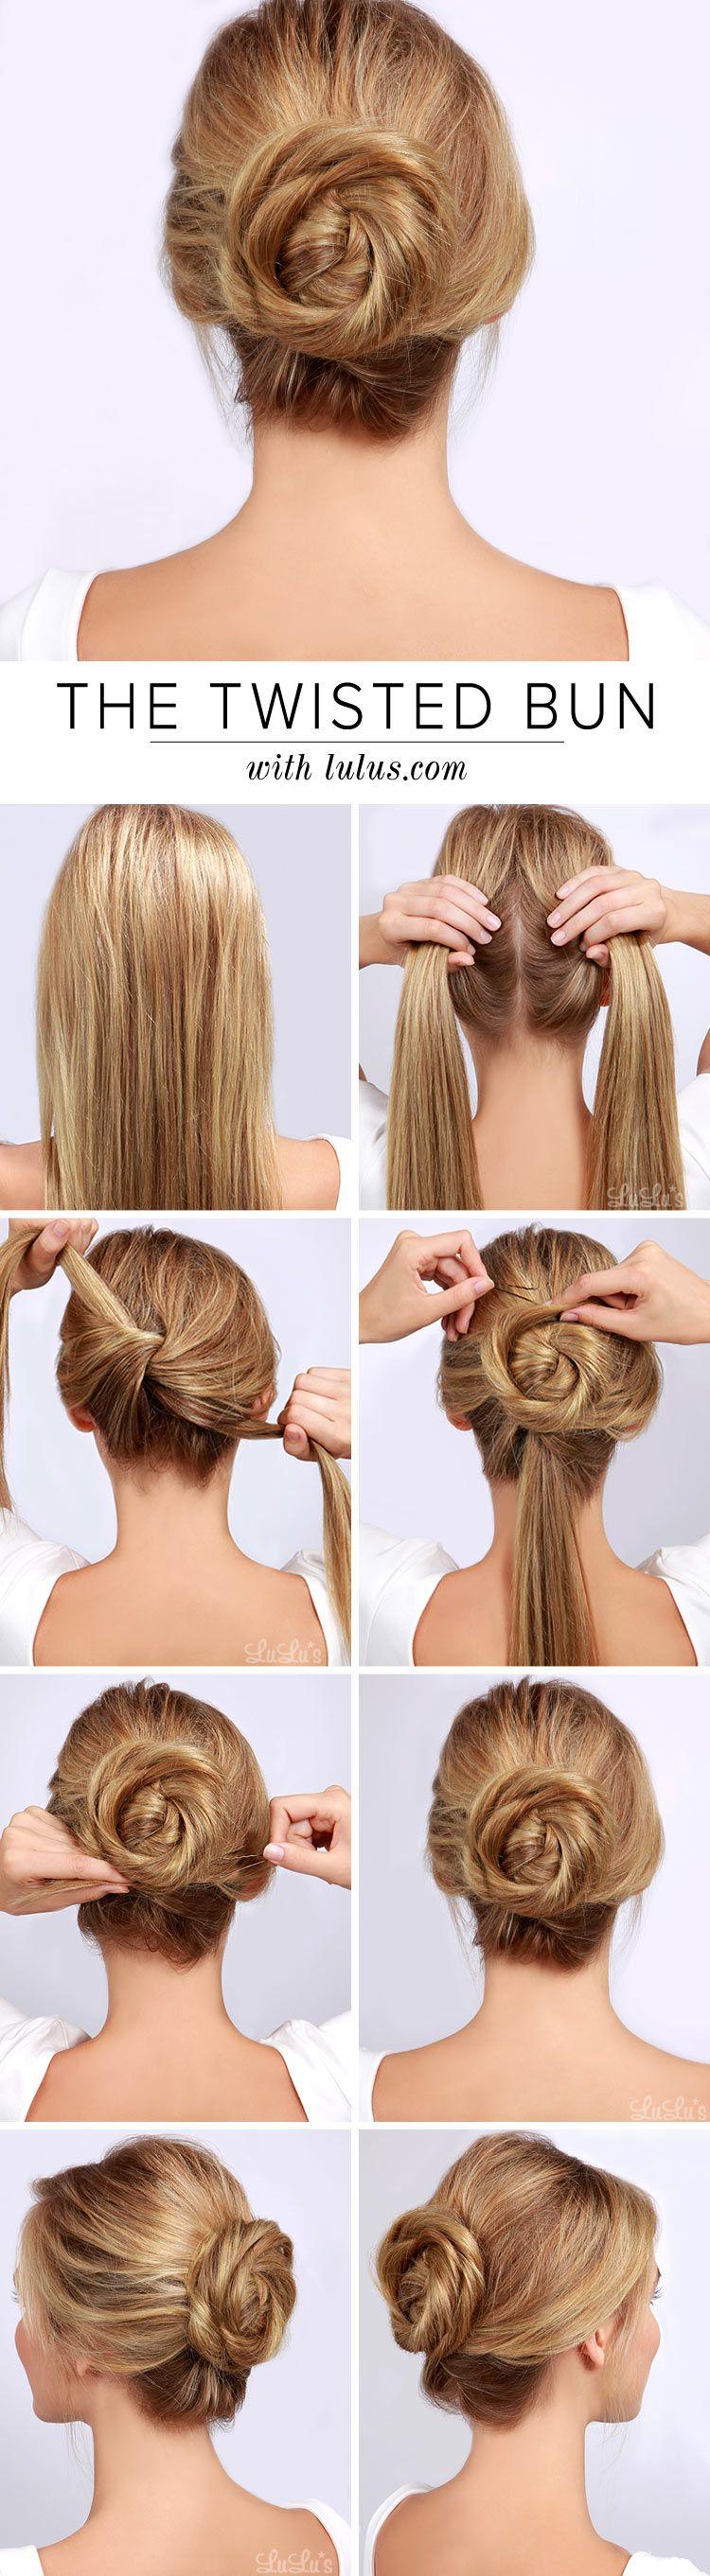 Lulus How To Twisted Bun Hair Tutorial Lulus Com Fashion Blog Hair Bun Tutorial Hair Styles Long Hair Styles